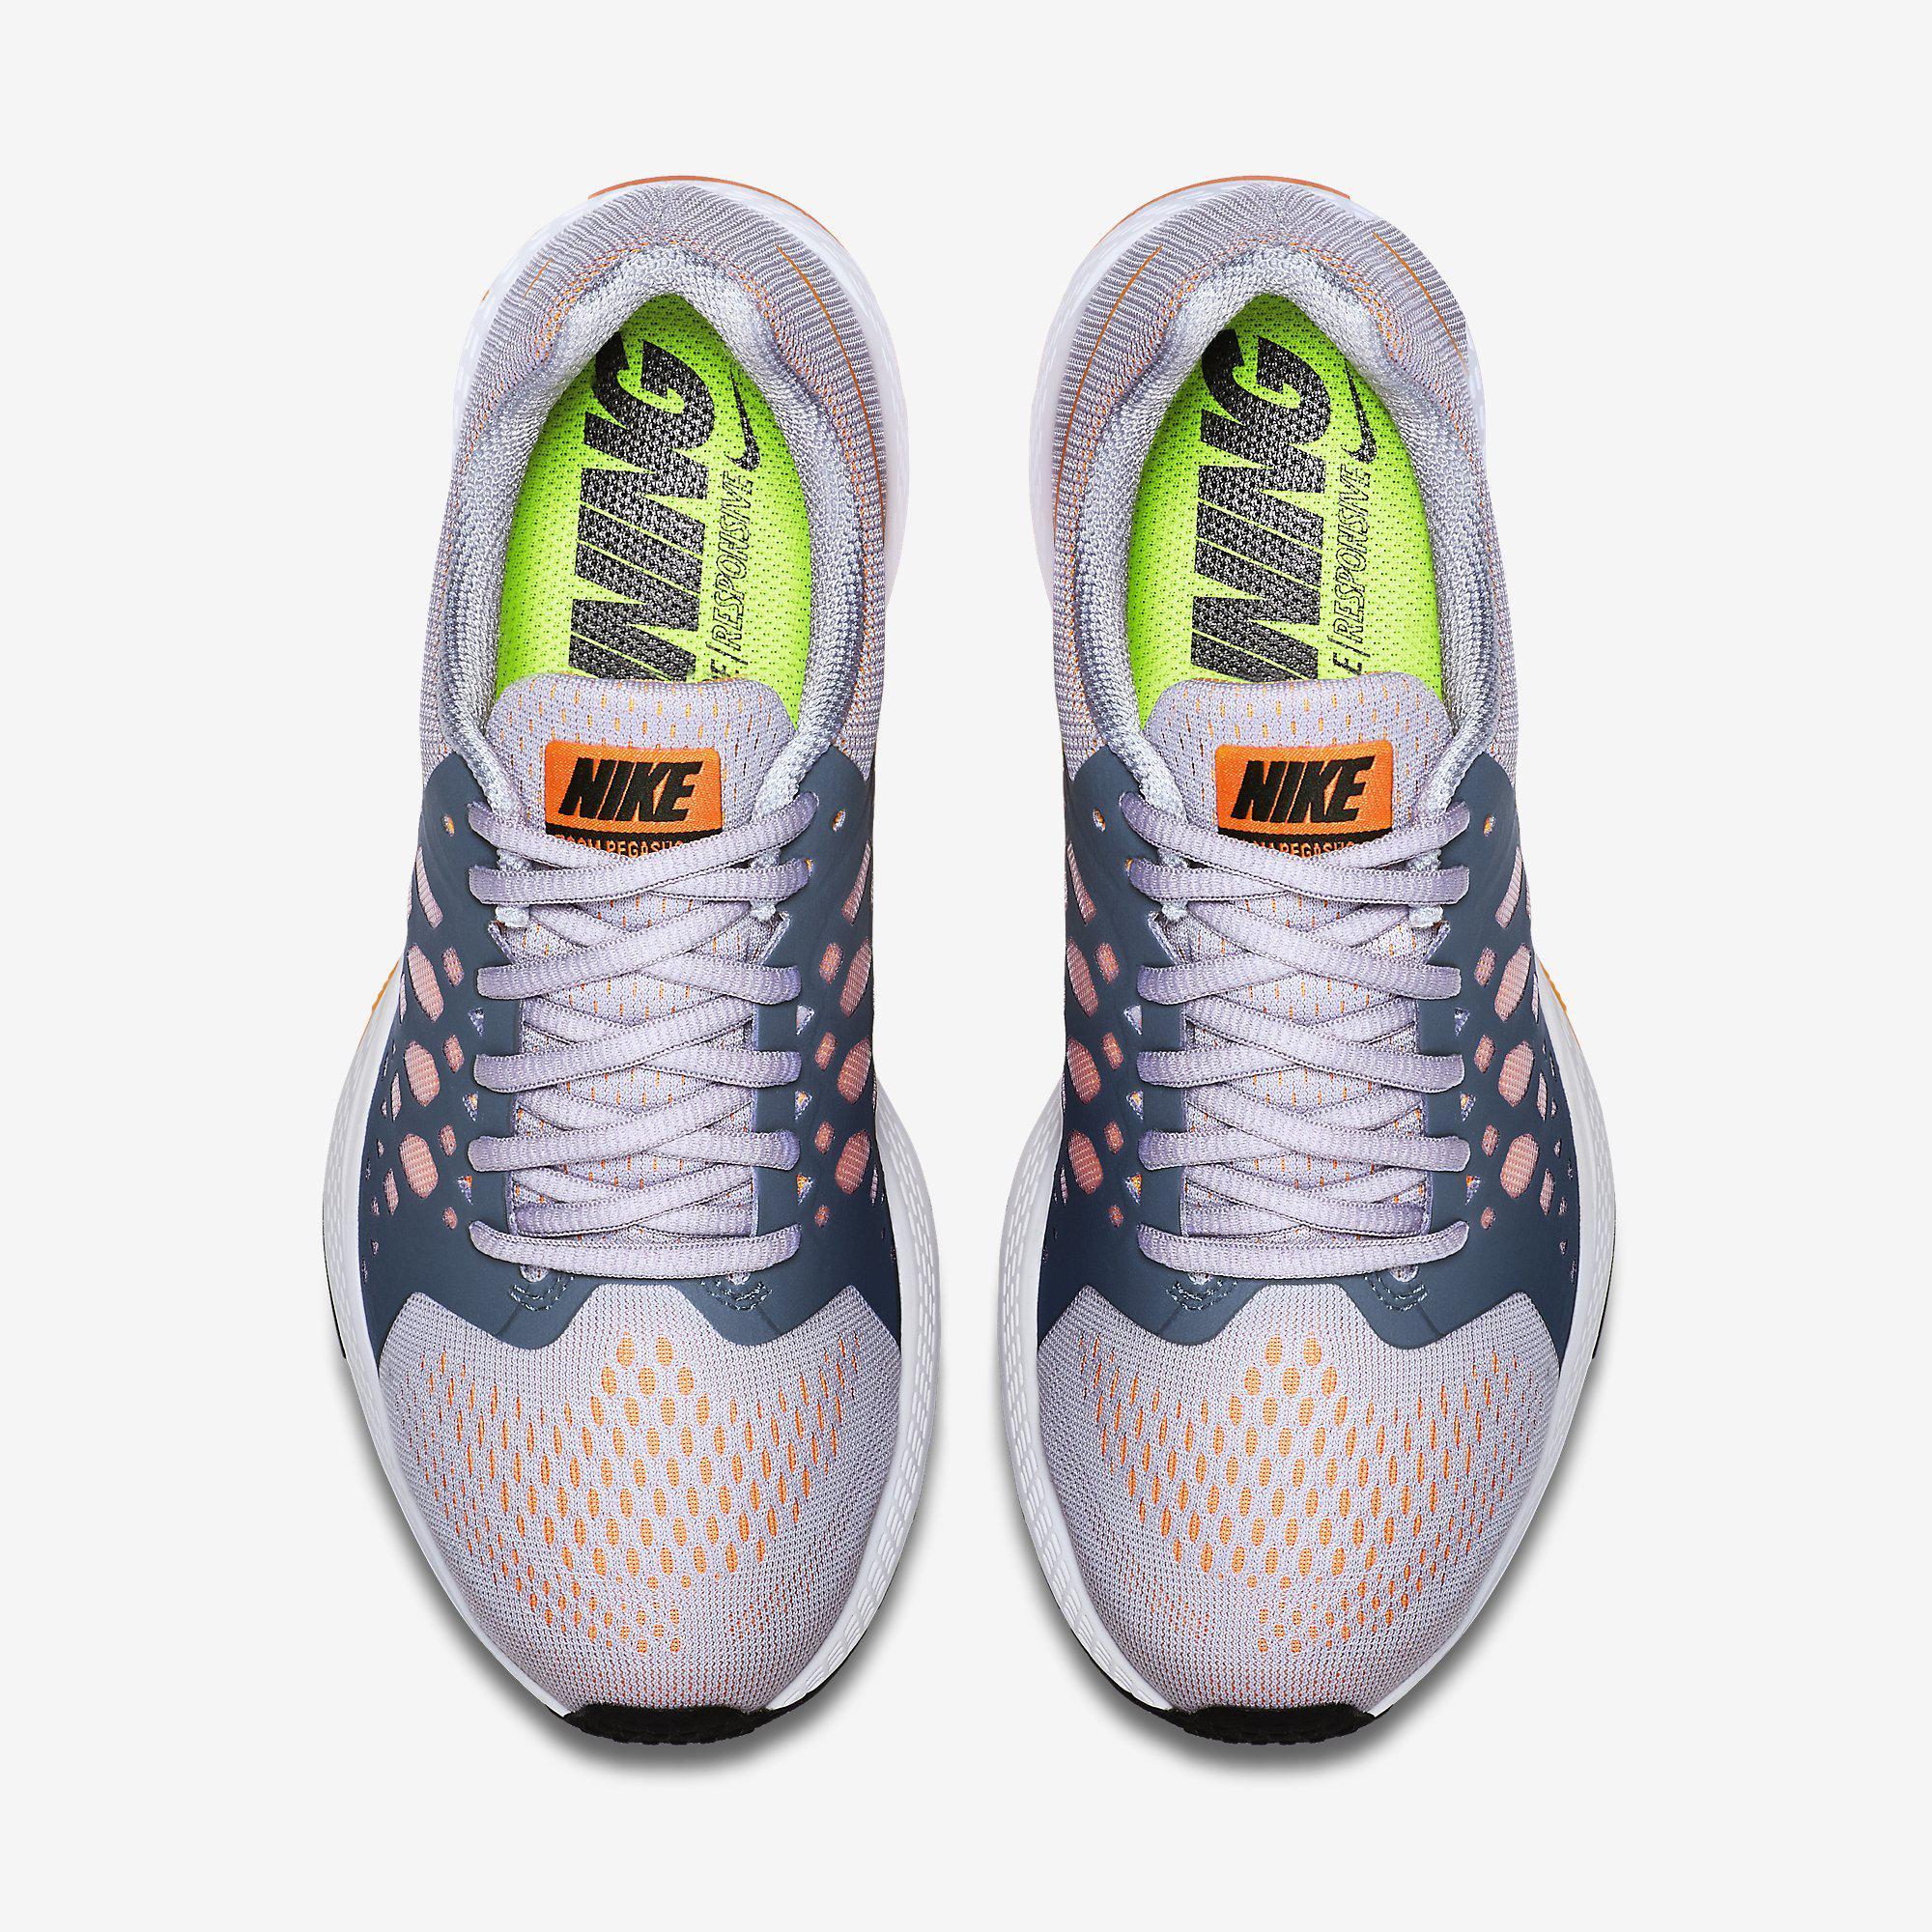 Nike Womens Air Zoom Pegasus+ 31 Running Shoes - Titanium